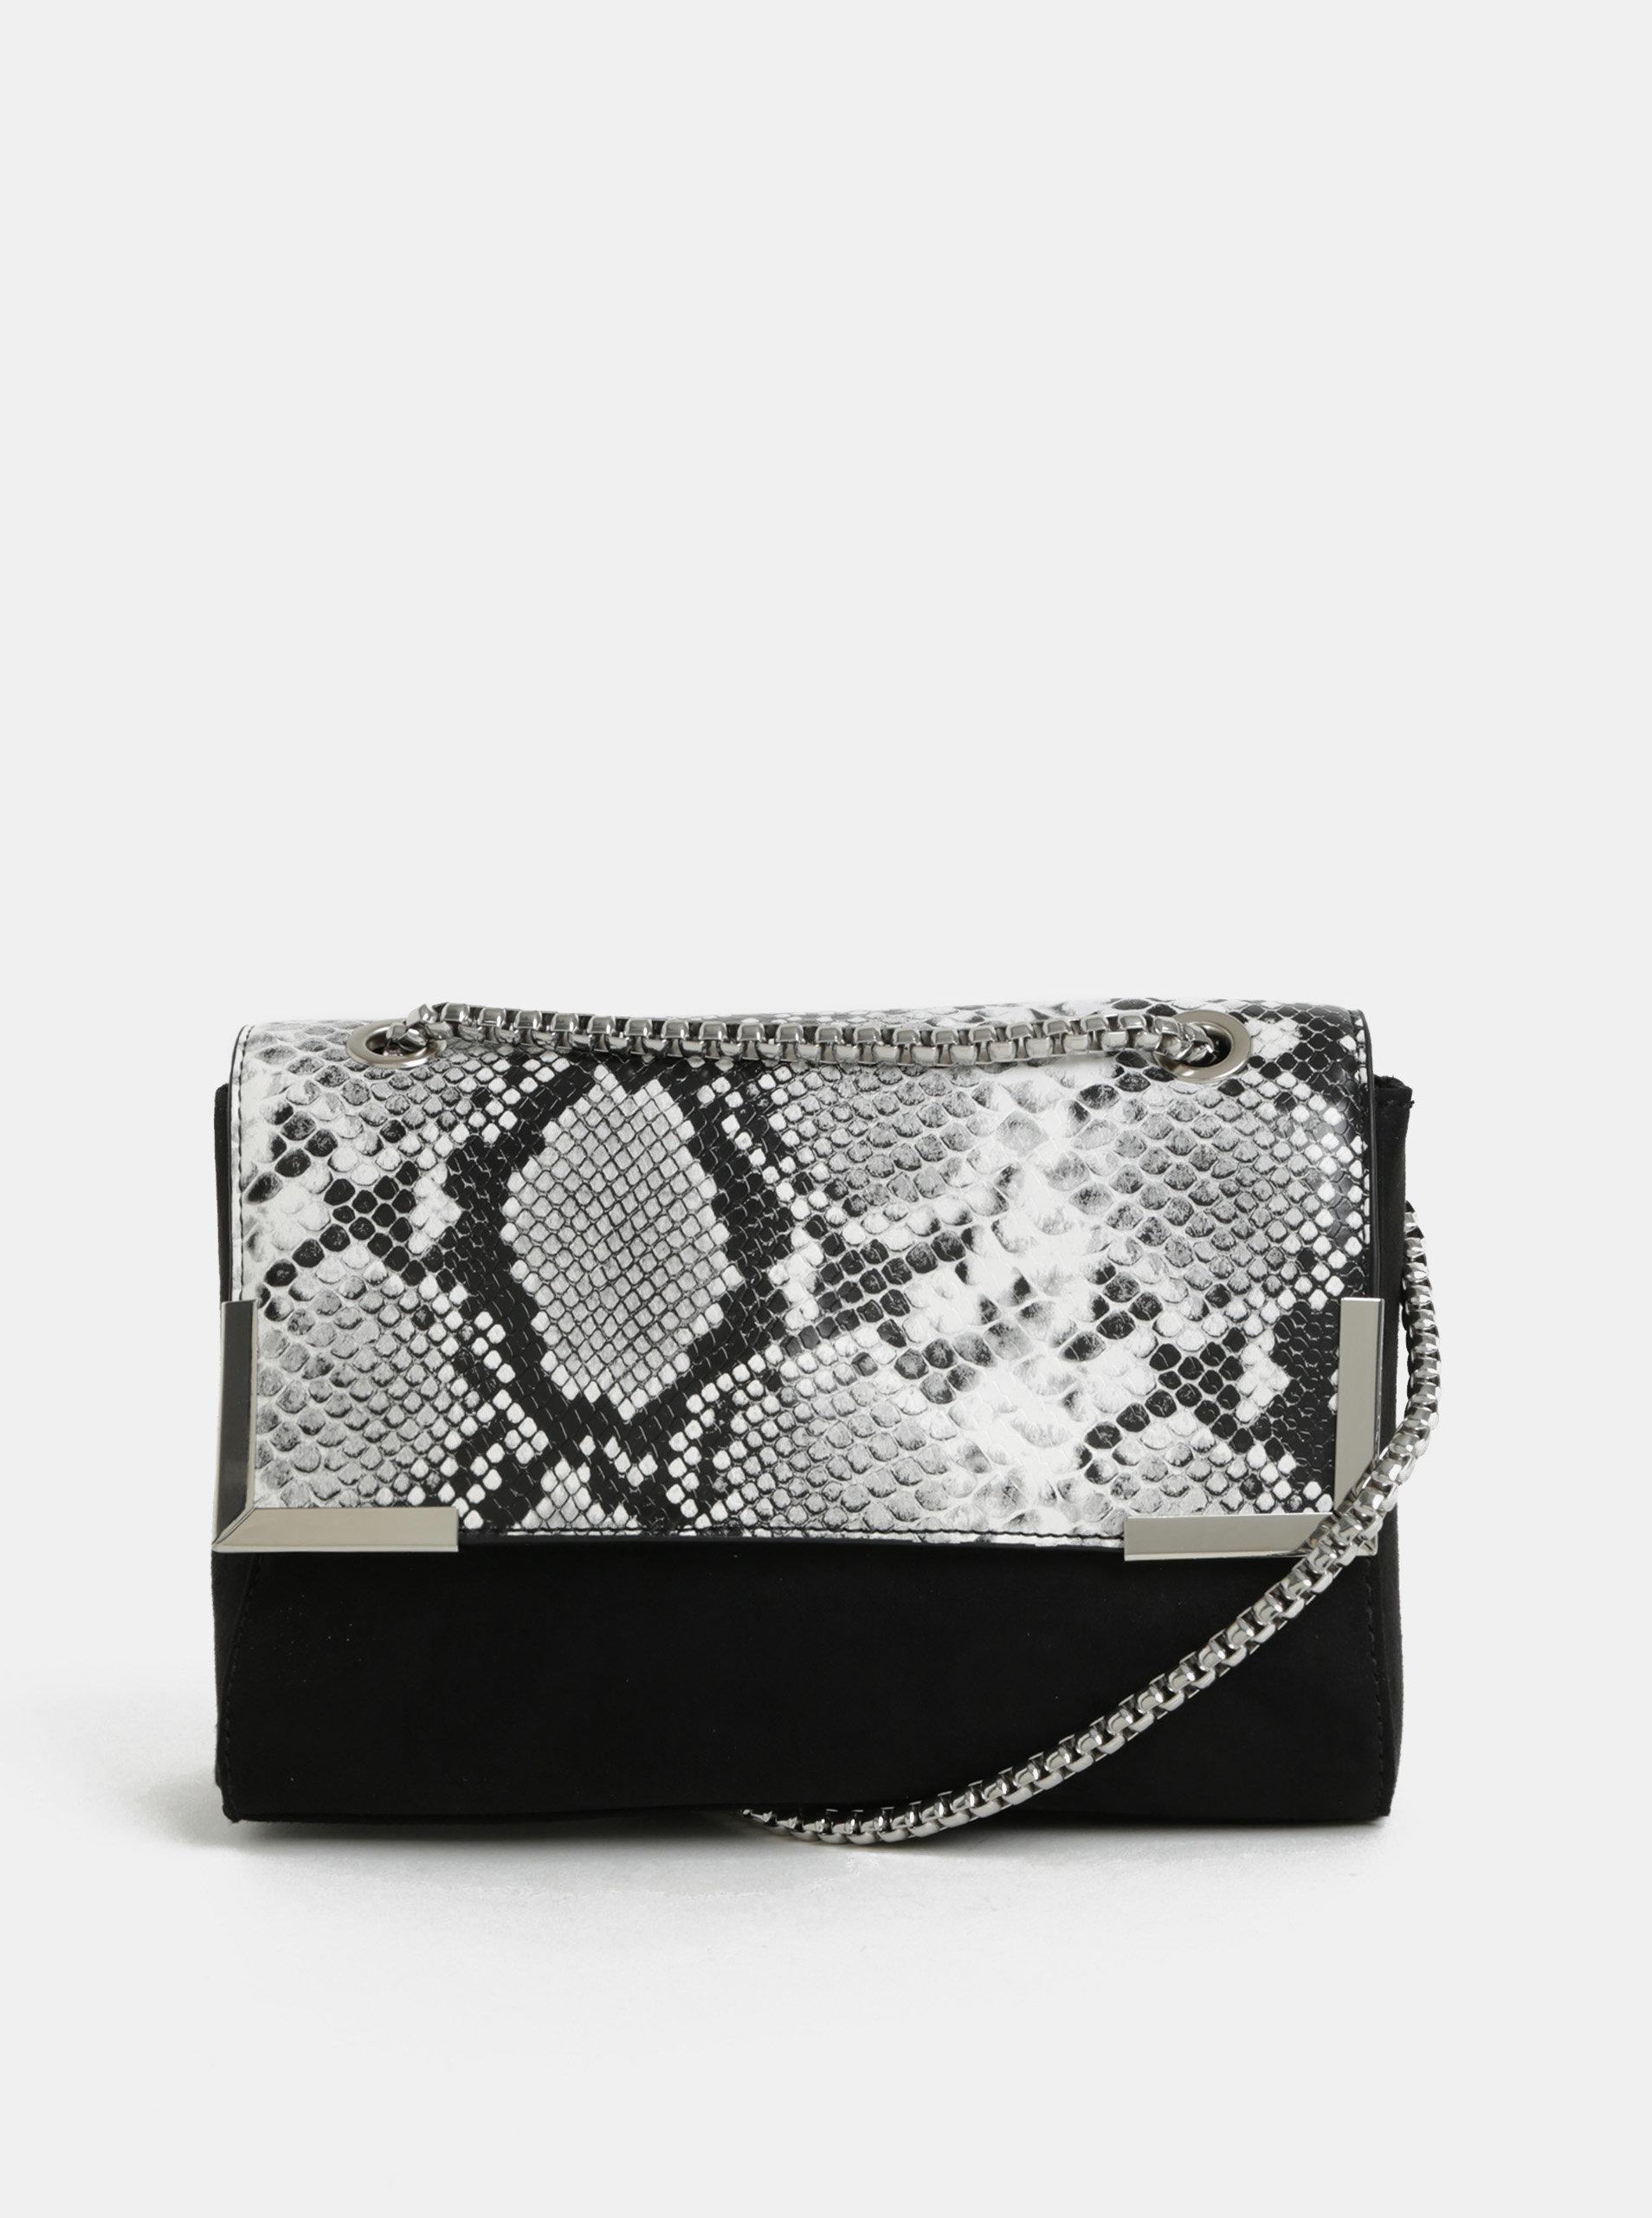 b3ad817fa8 Černá crossbody kabelka s hadím vzorem Dorothy Perkins ...